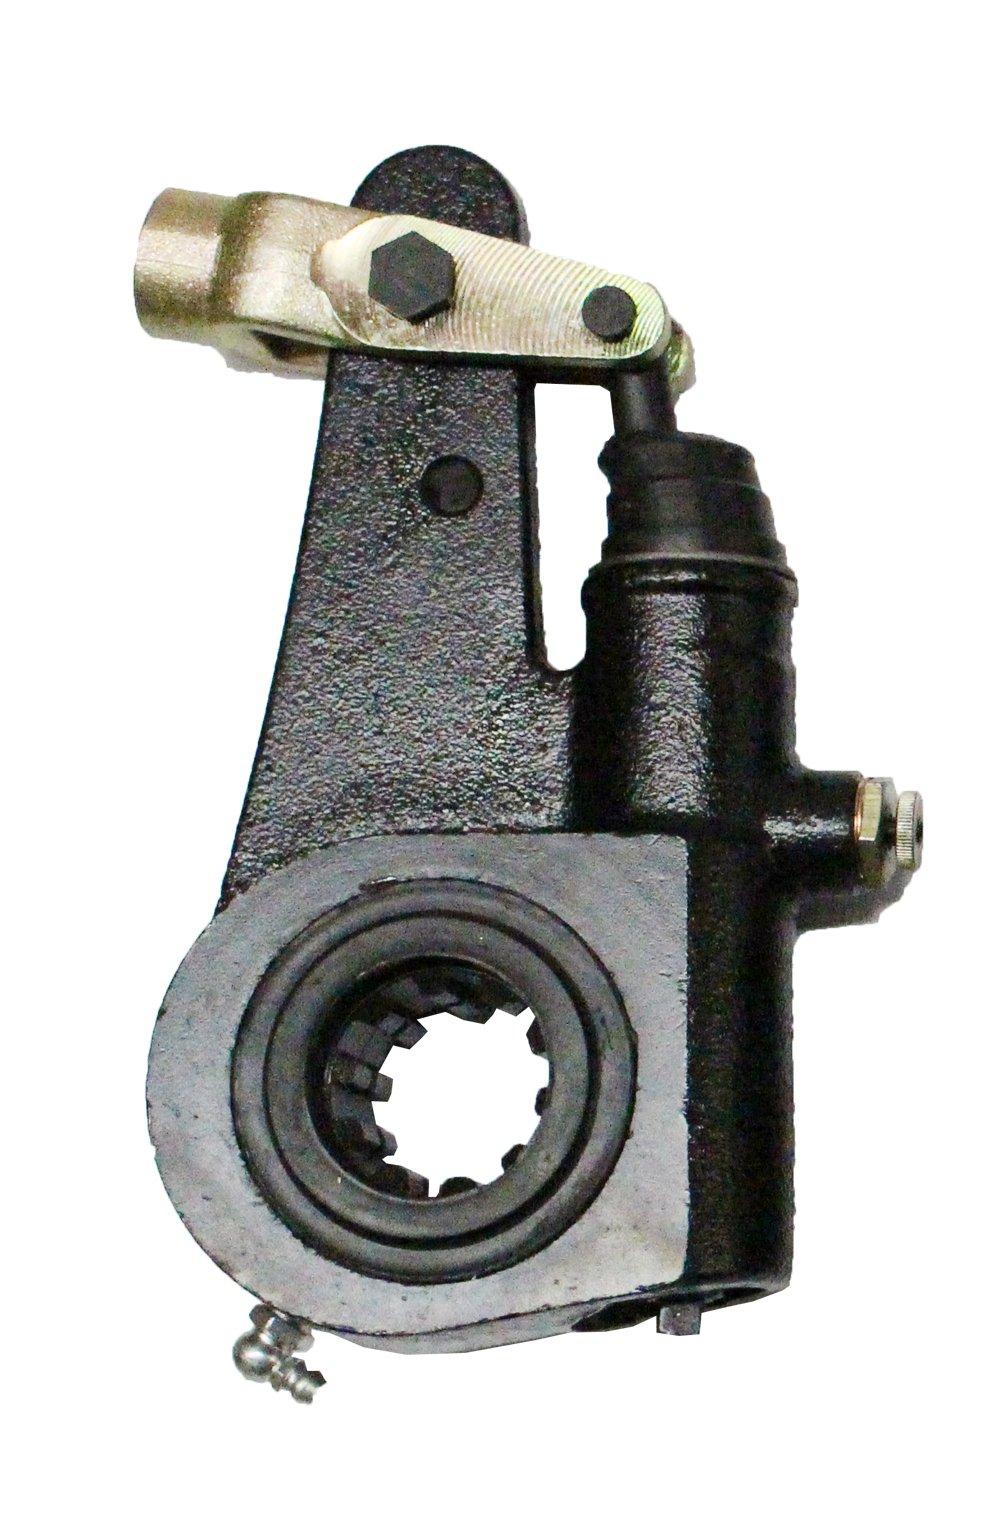 PetaParts PAW 25-011 Automatic Slack Adjuster (1-1/2'' - 10 Spline, 5-1/2'' Length) by PETAPARTS